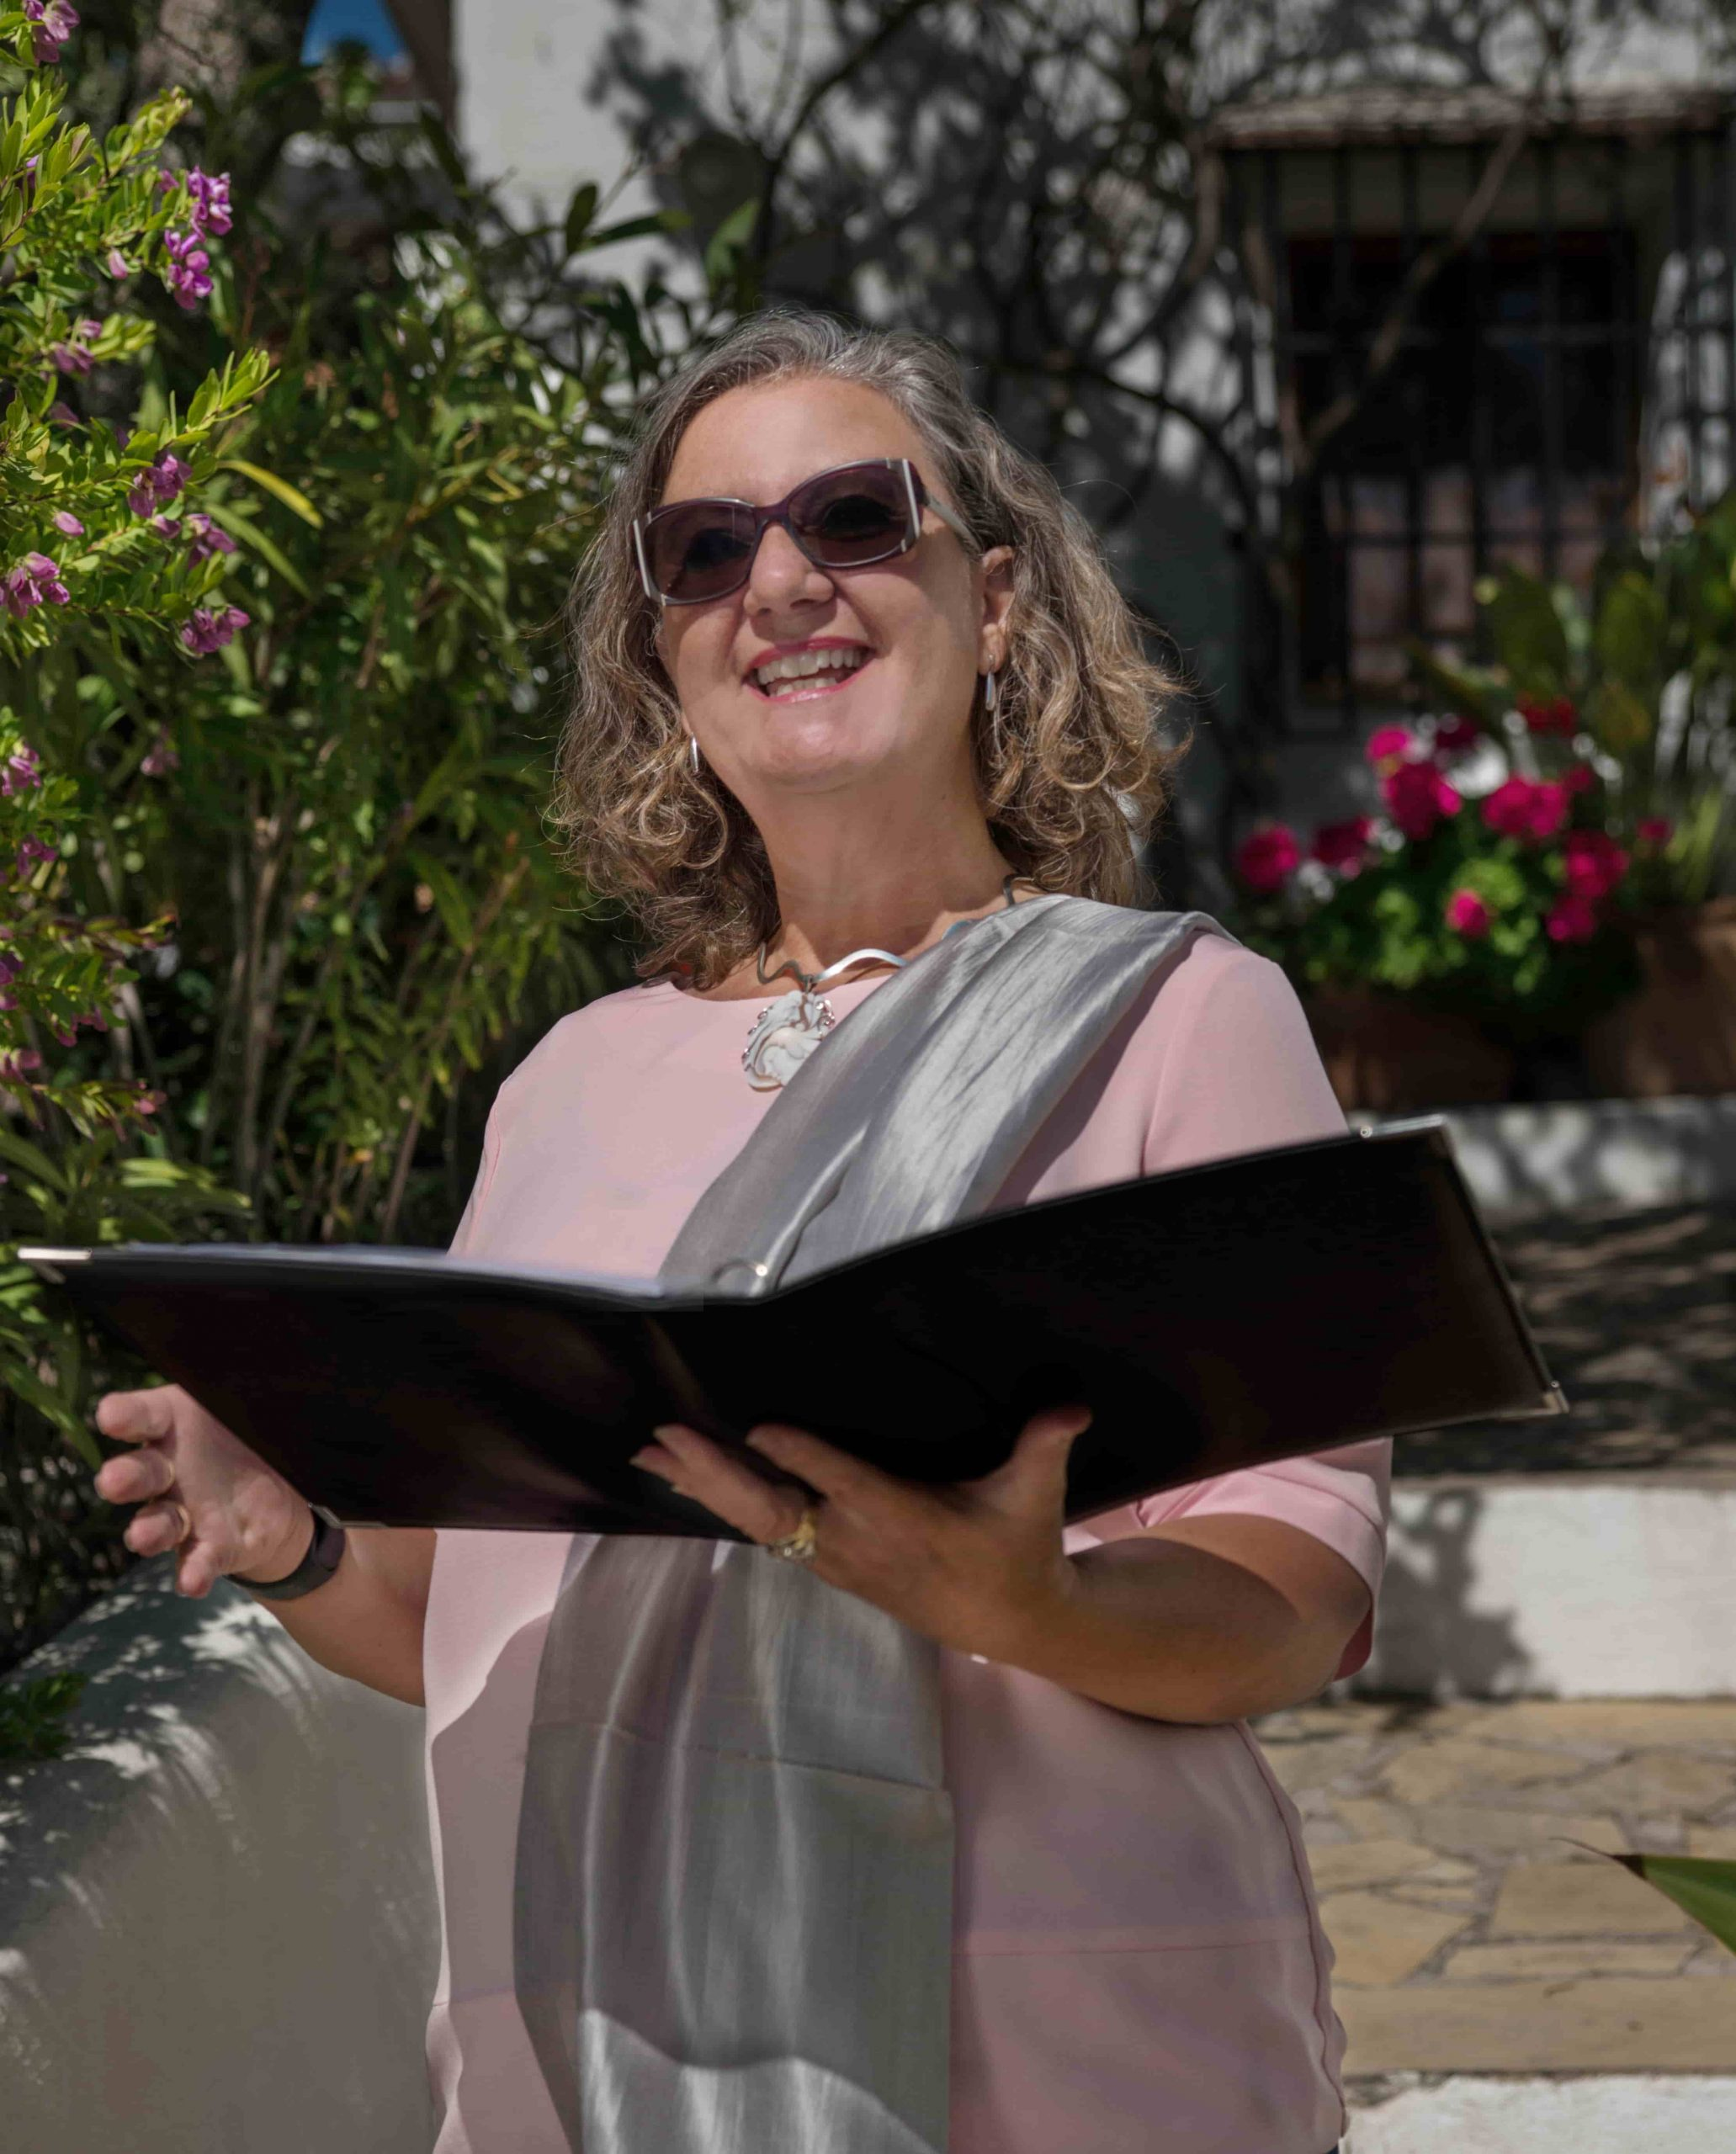 Wendy-Sherwood-Celebrant-Reading-From-Black-Folder